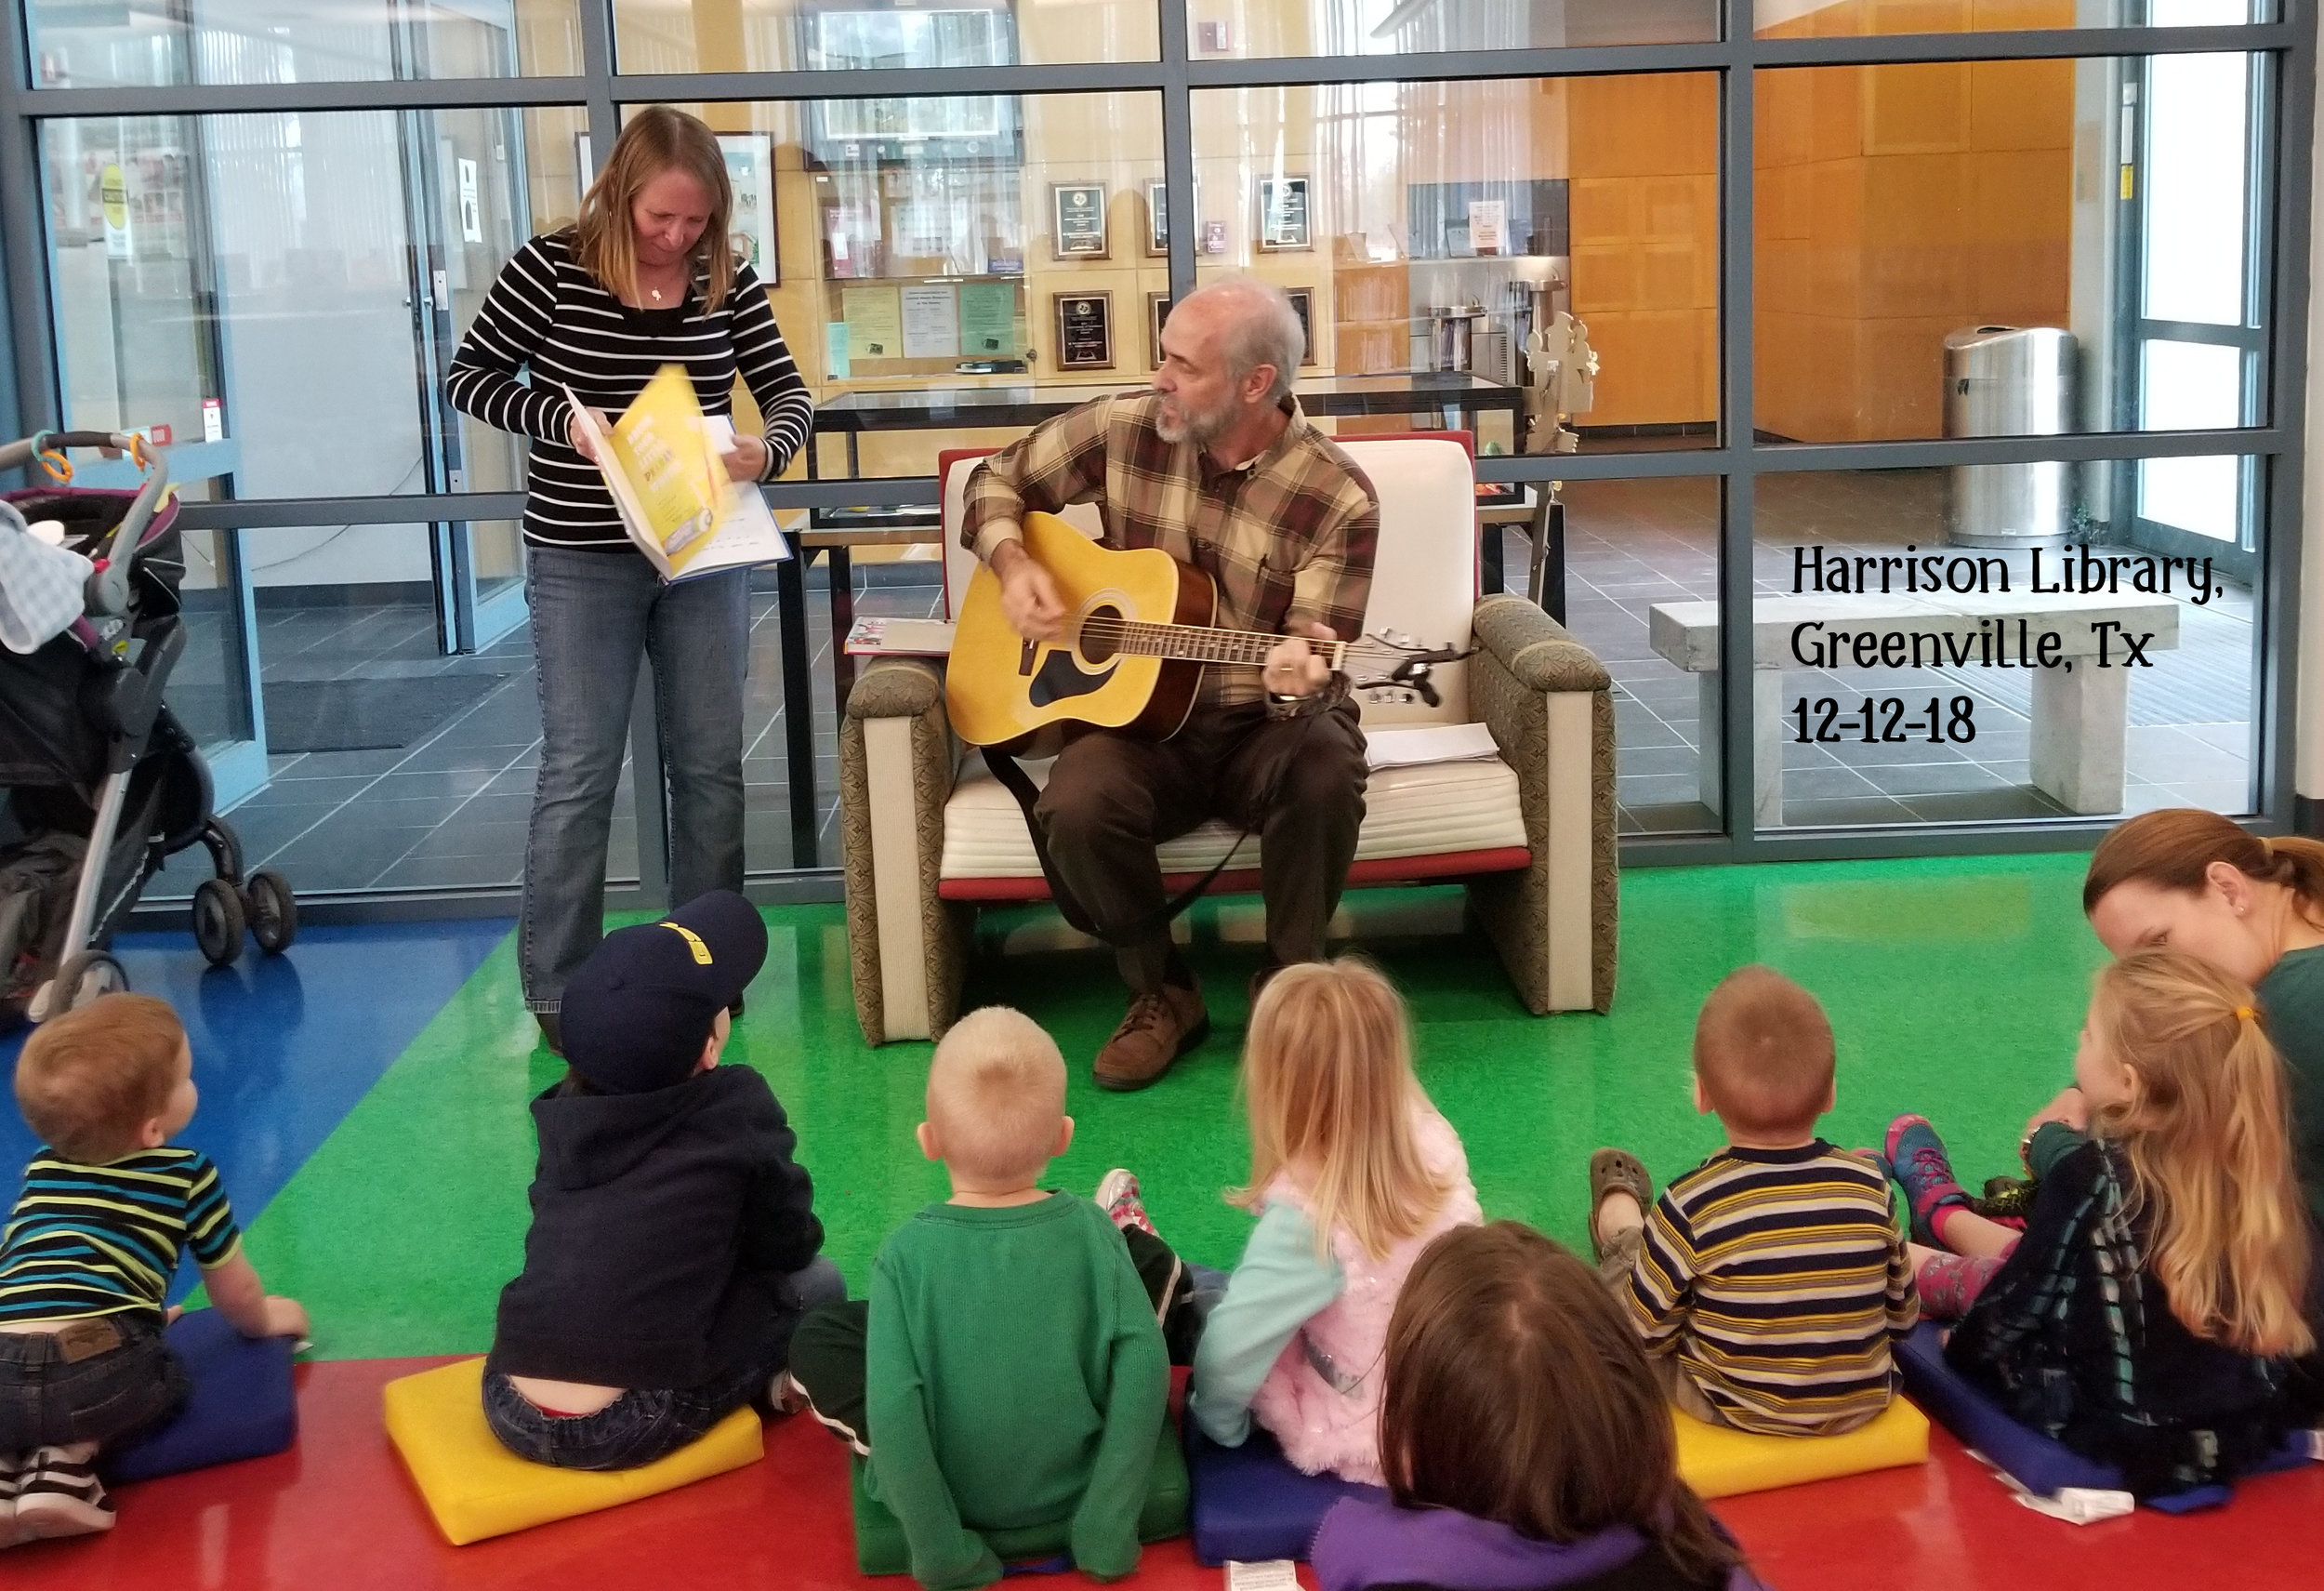 Harrison Library 12-12-18.jpg